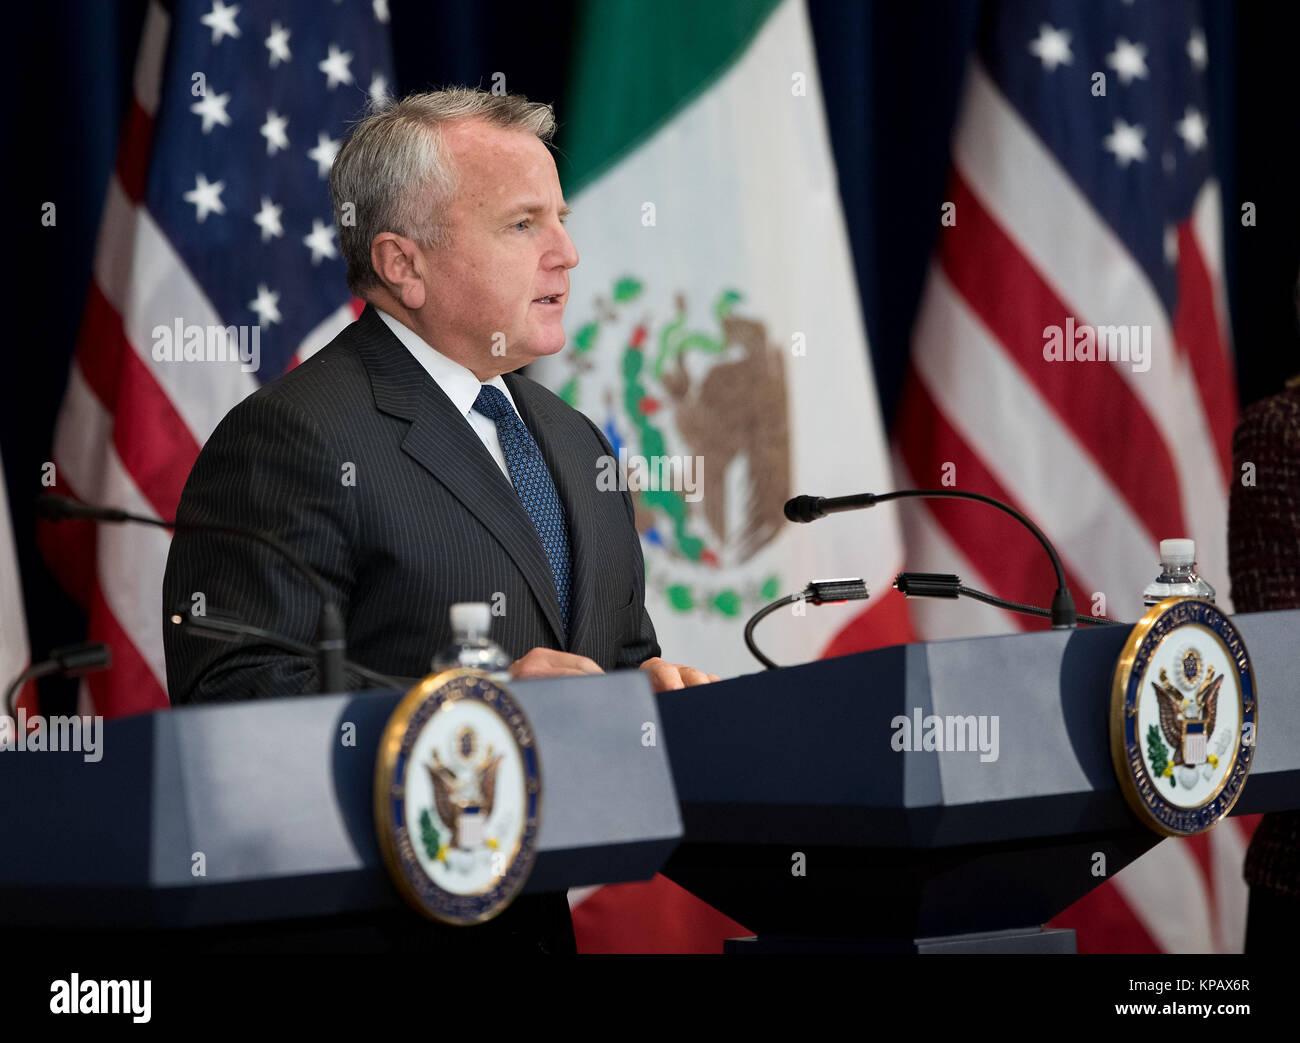 Washington, DC, USA. 14th Dec, 2017. U.S. Deputy Secretary of State John Sullivan speaks during a press conference - Stock Image